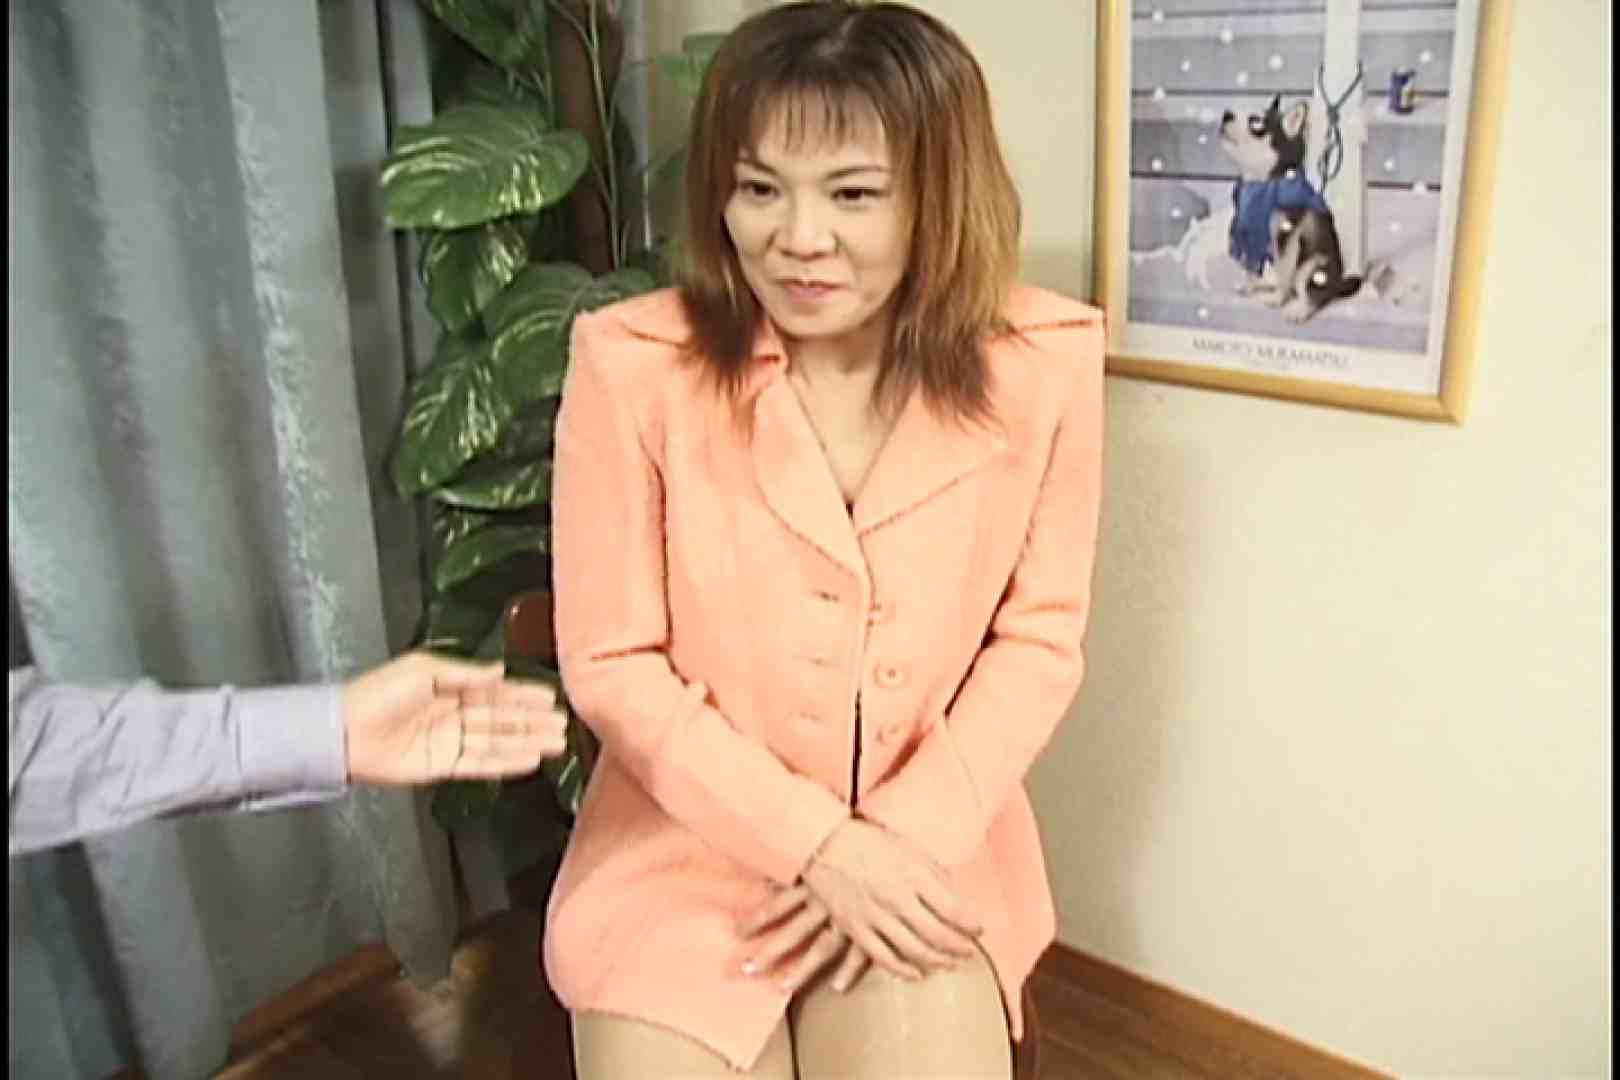 昼間の奥様は欲求不満 ~桜井昌子~ フェラ SEX無修正画像 60連発 26